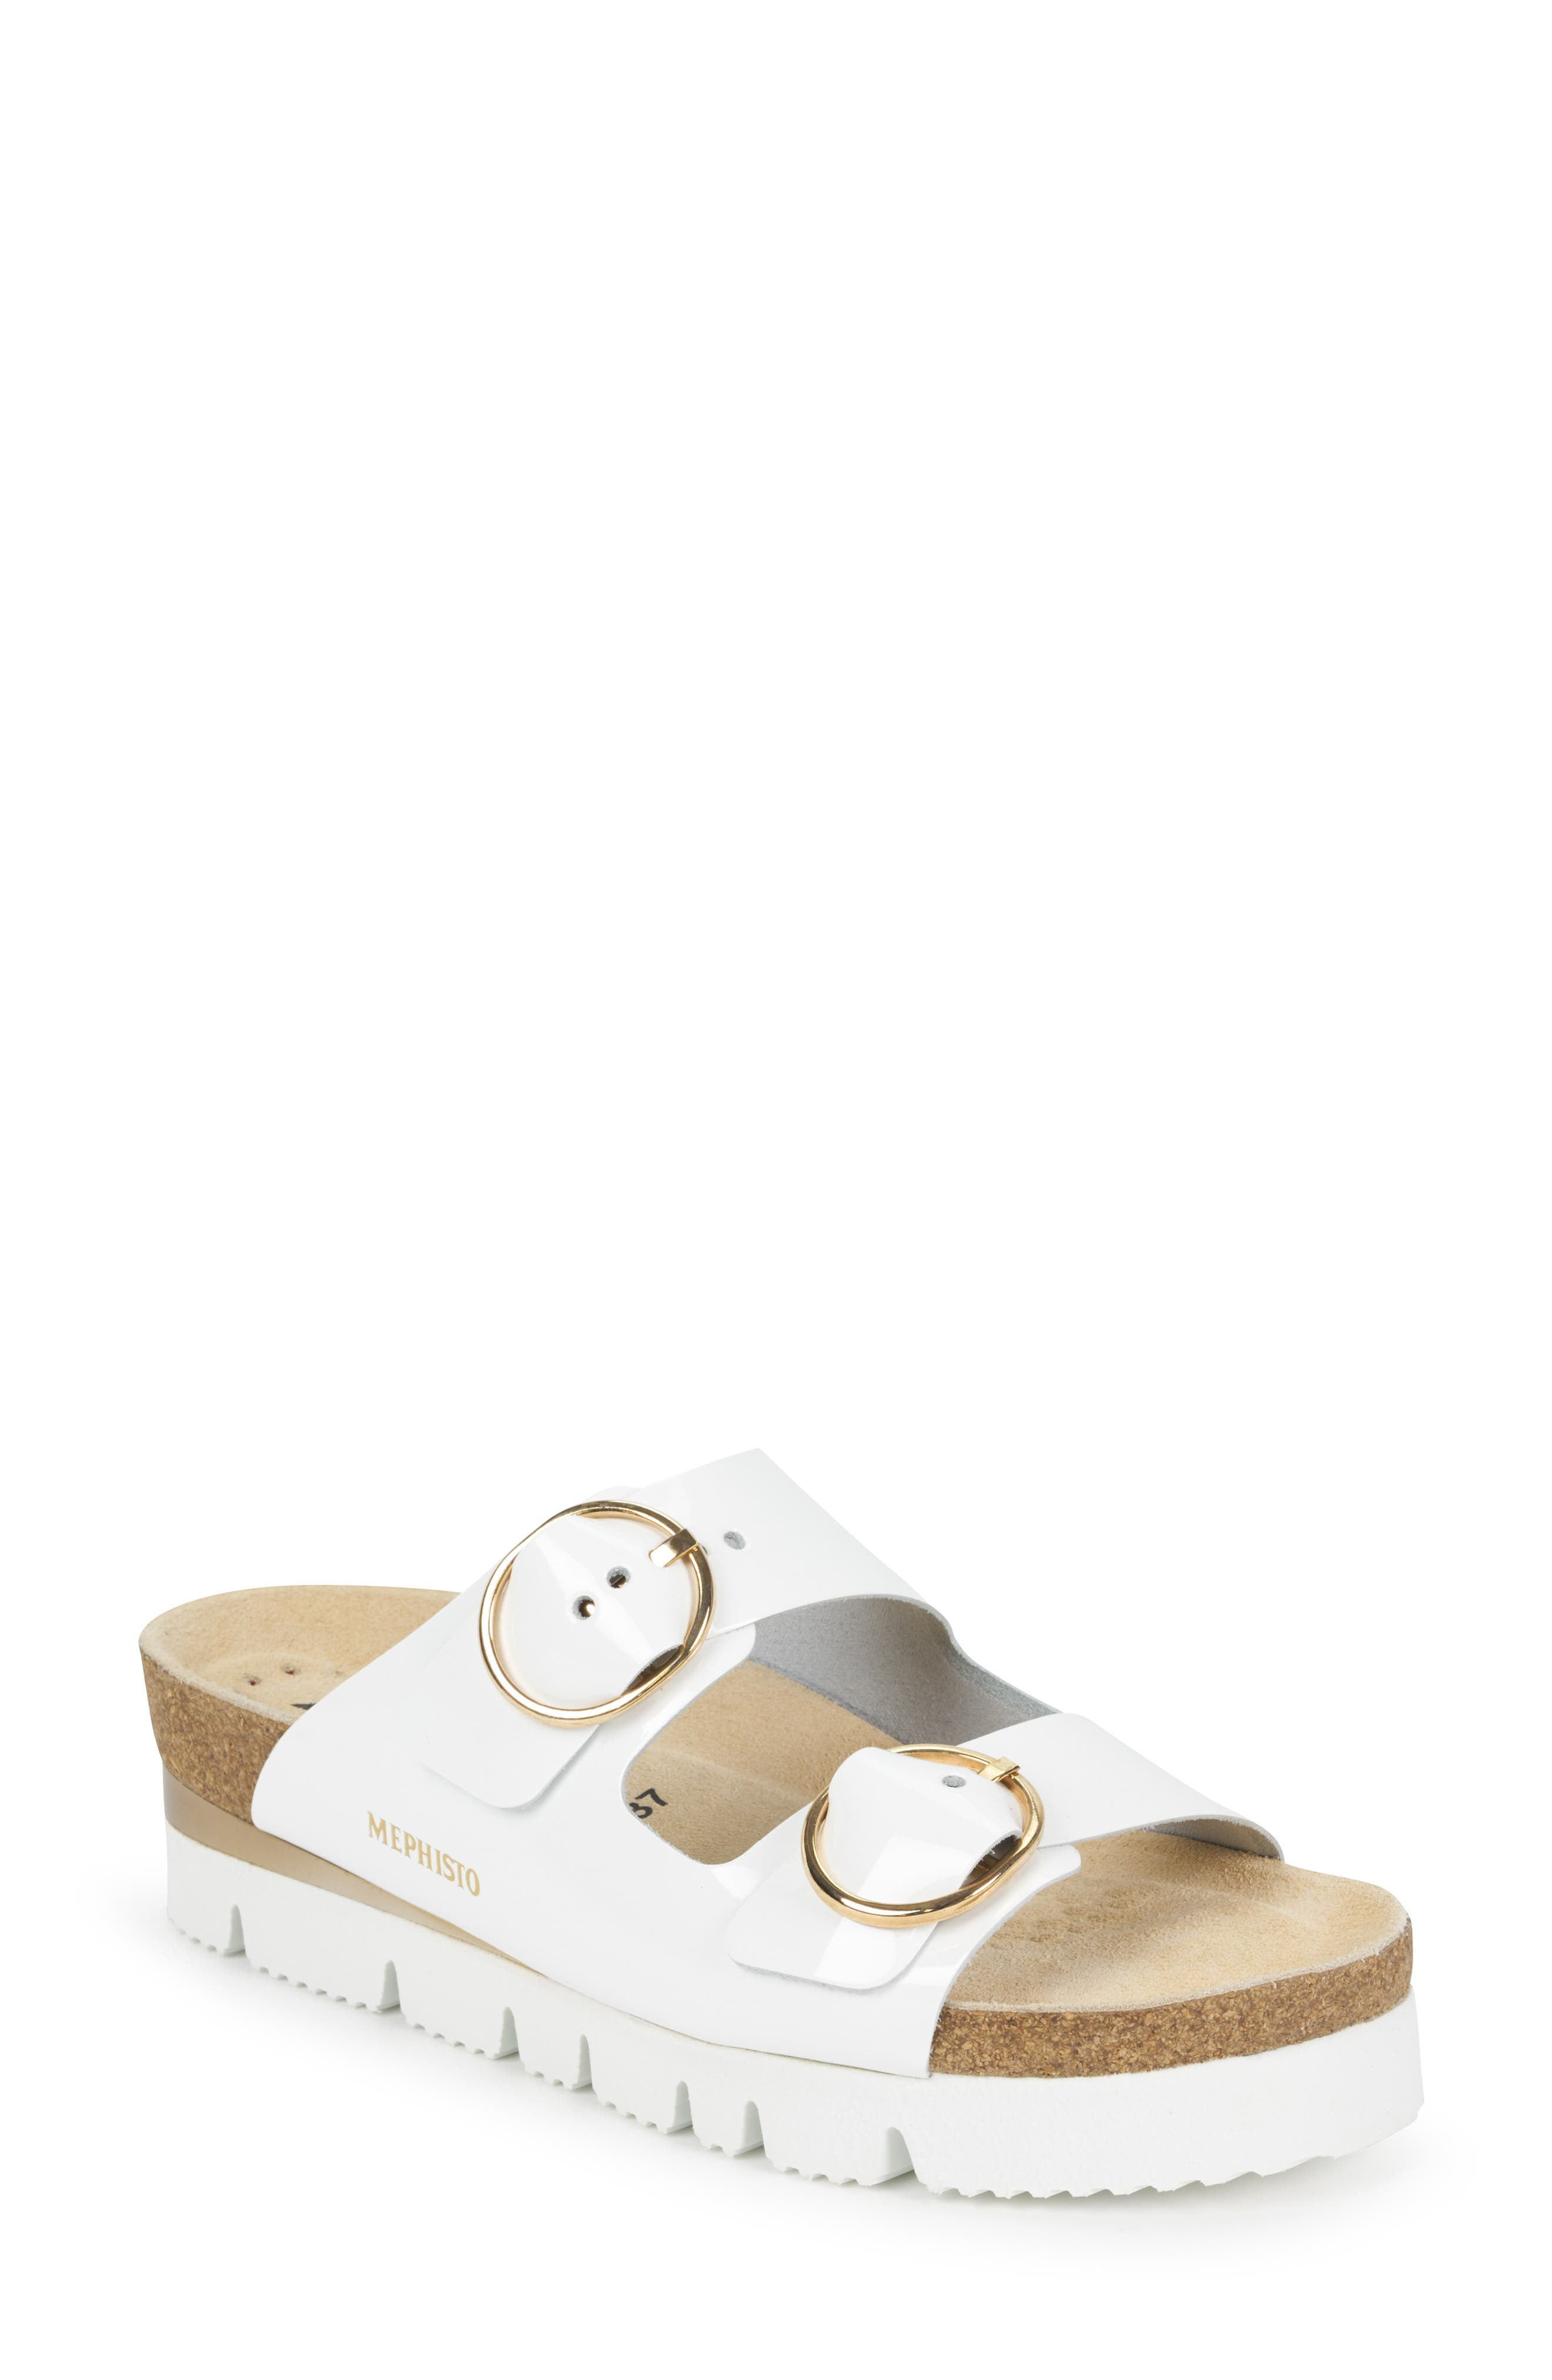 MEPHISTO Vandy Slide Sandal, Main, color, WHITE PATENT LEATHER